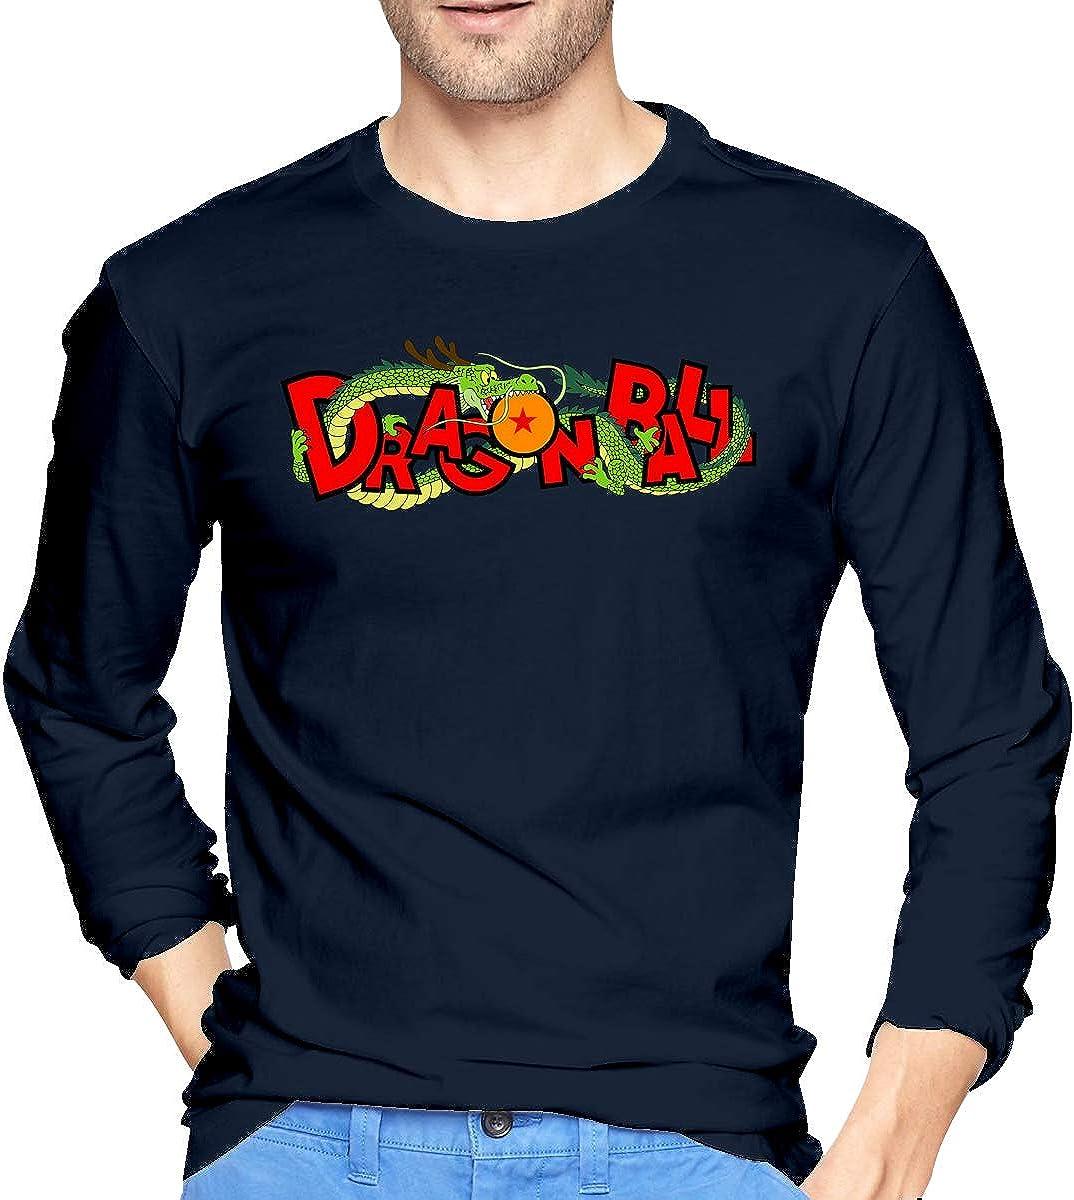 BeiTong Dragon Ball Long Sleeves Tshirt New Top for Mens Black